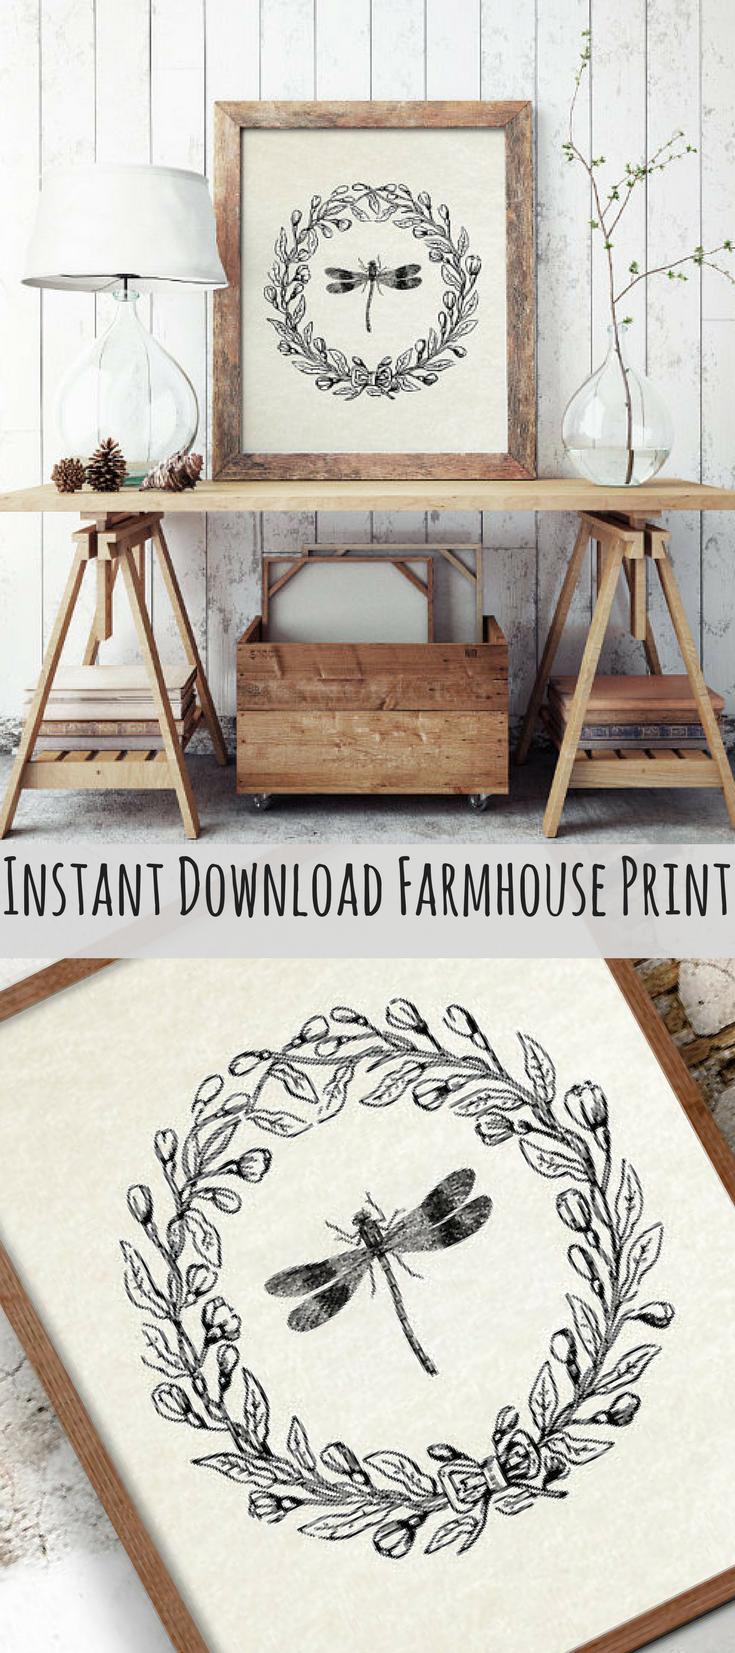 Dragon Fly Print Farmhouse Printable French Country Decor